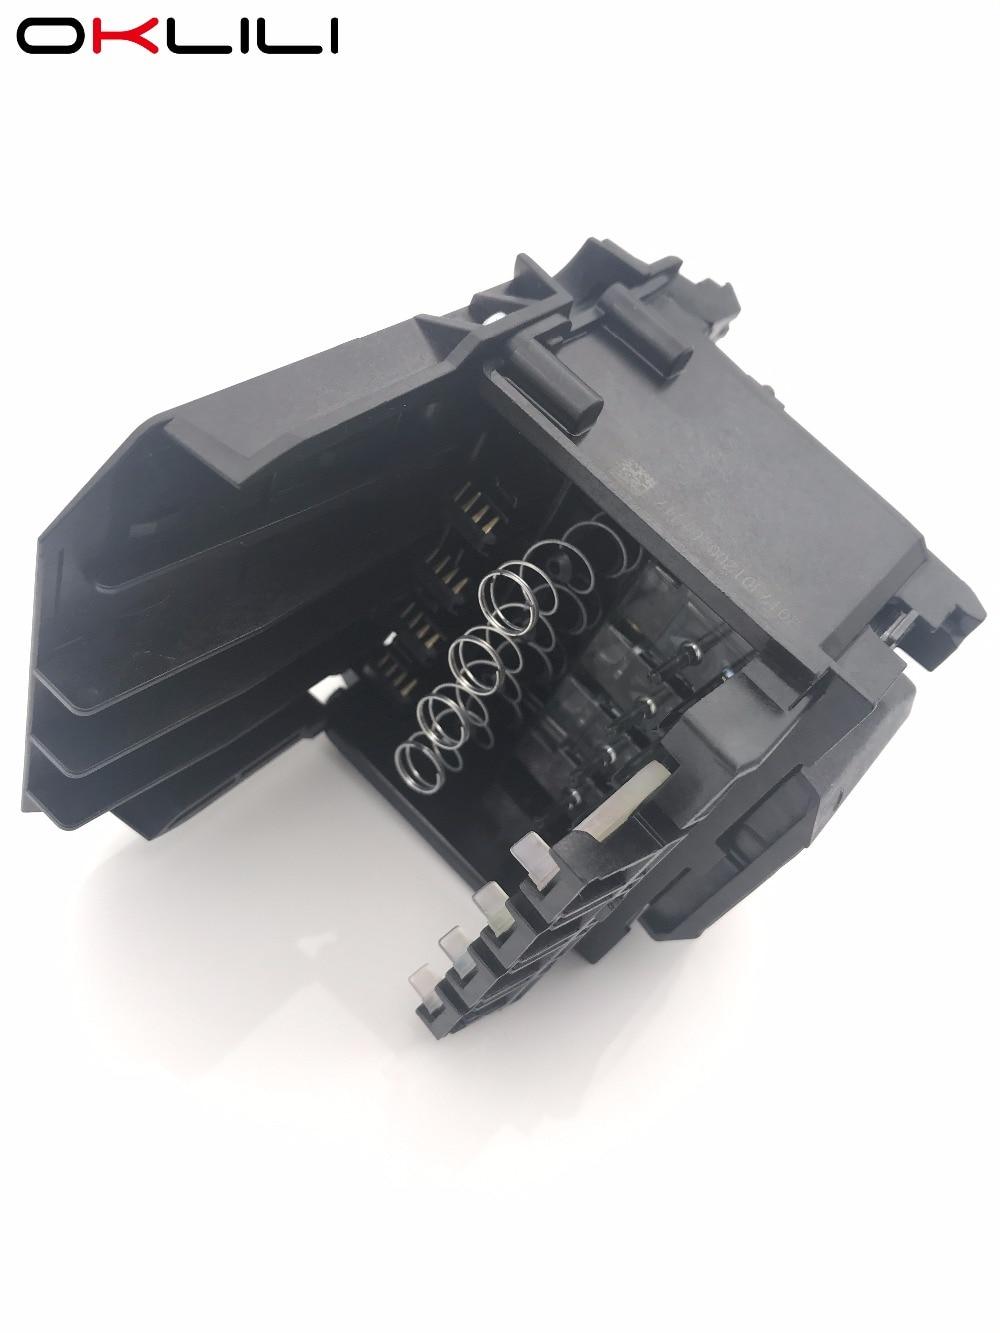 CB863-80013A CB863-80002A 932 933 932XL 933XL Druckkopf Drucker druckkopf für HP 6060e 6100 6100e 6600 6700 7110 7600 7610 7612